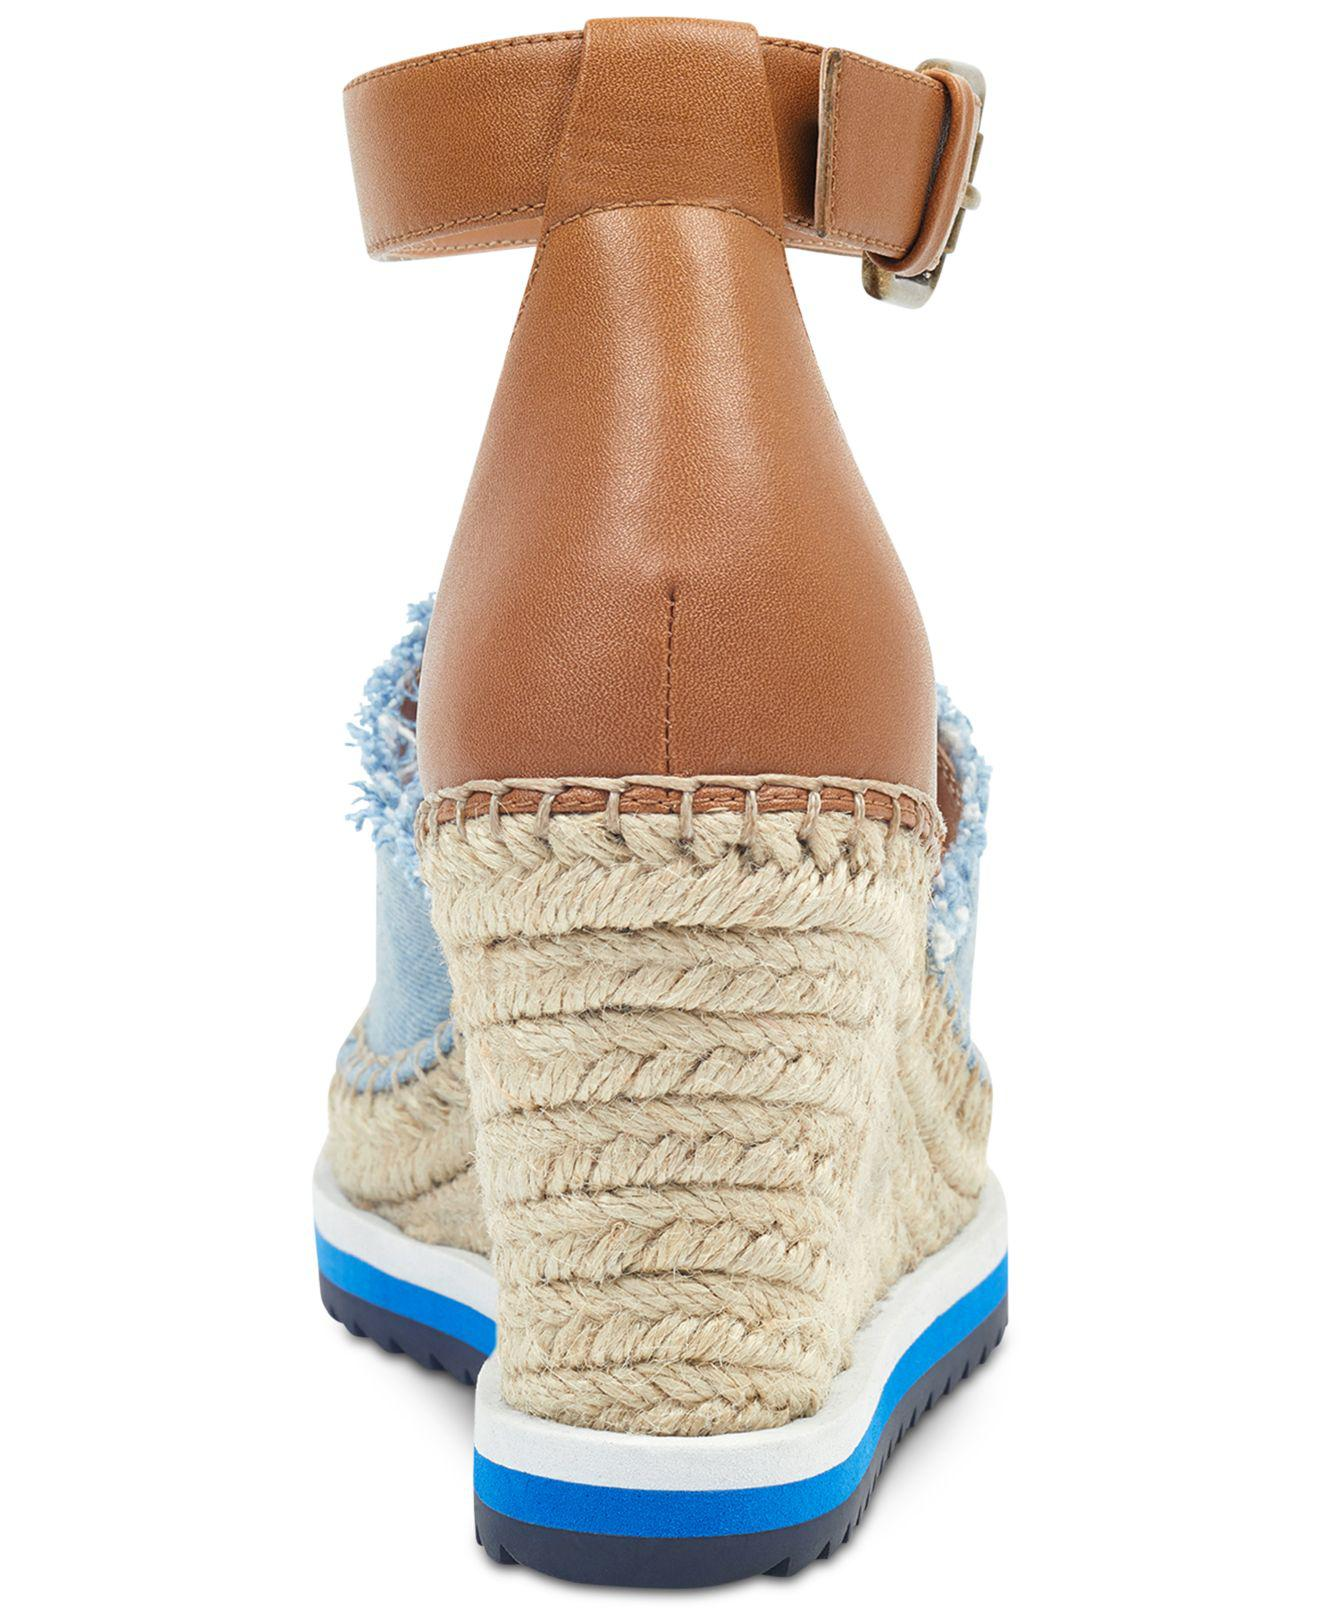 4587858e9b75 Lyst - Tommy Hilfiger Yavino Espadrille Platform Wedge Sandals in Blue